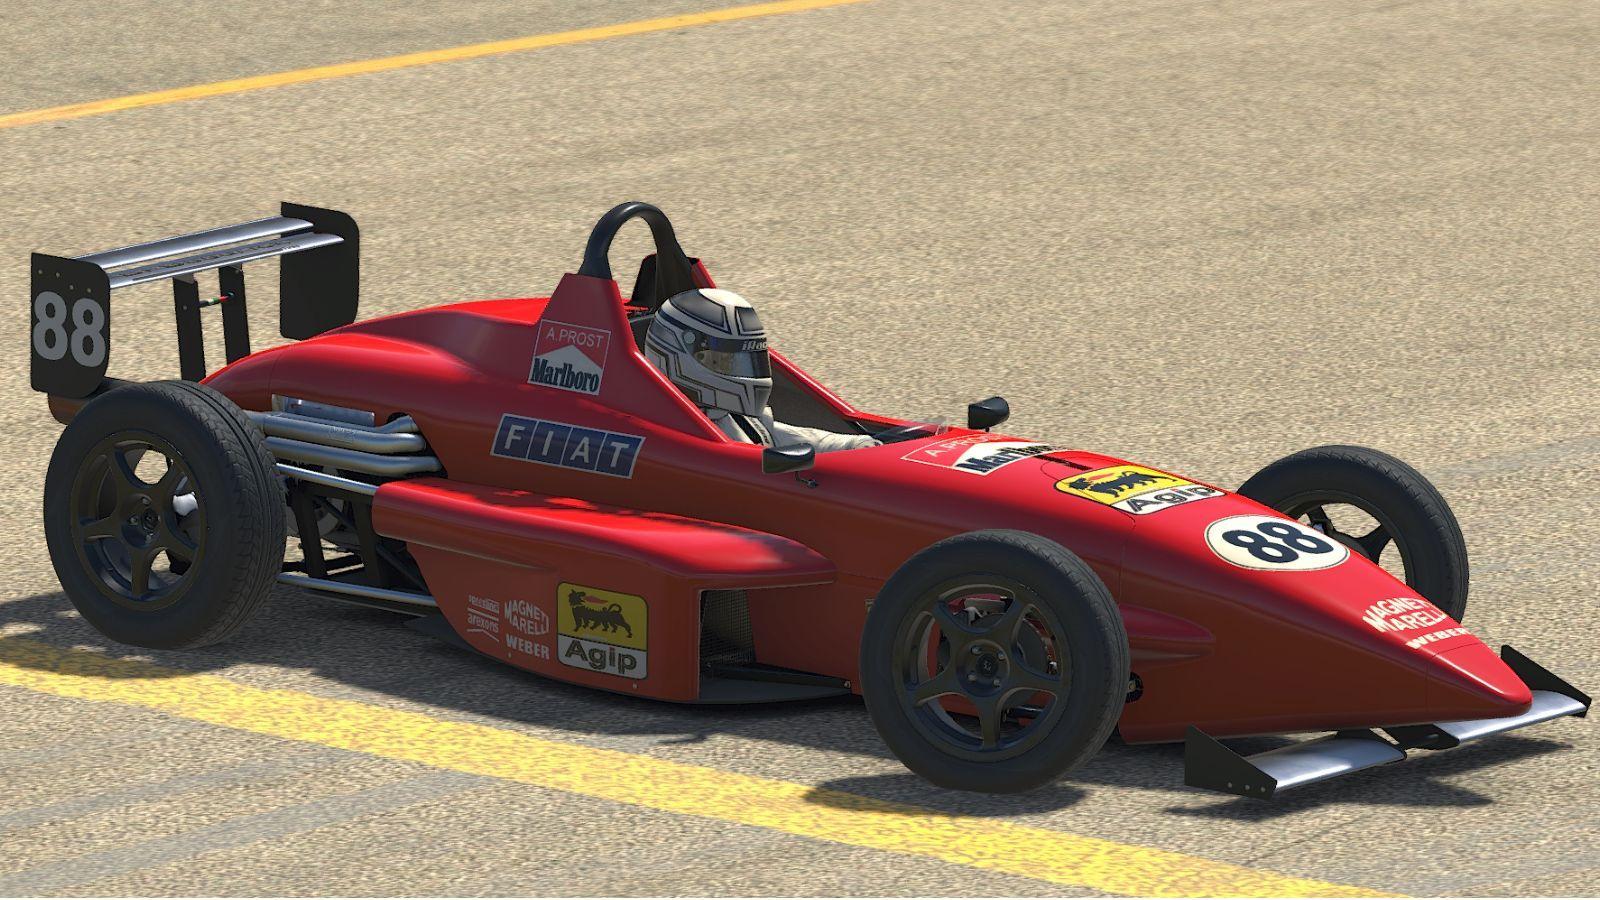 Preview of 1990 A Prost ferrari Formula Skip Barber  by Stephane Parent